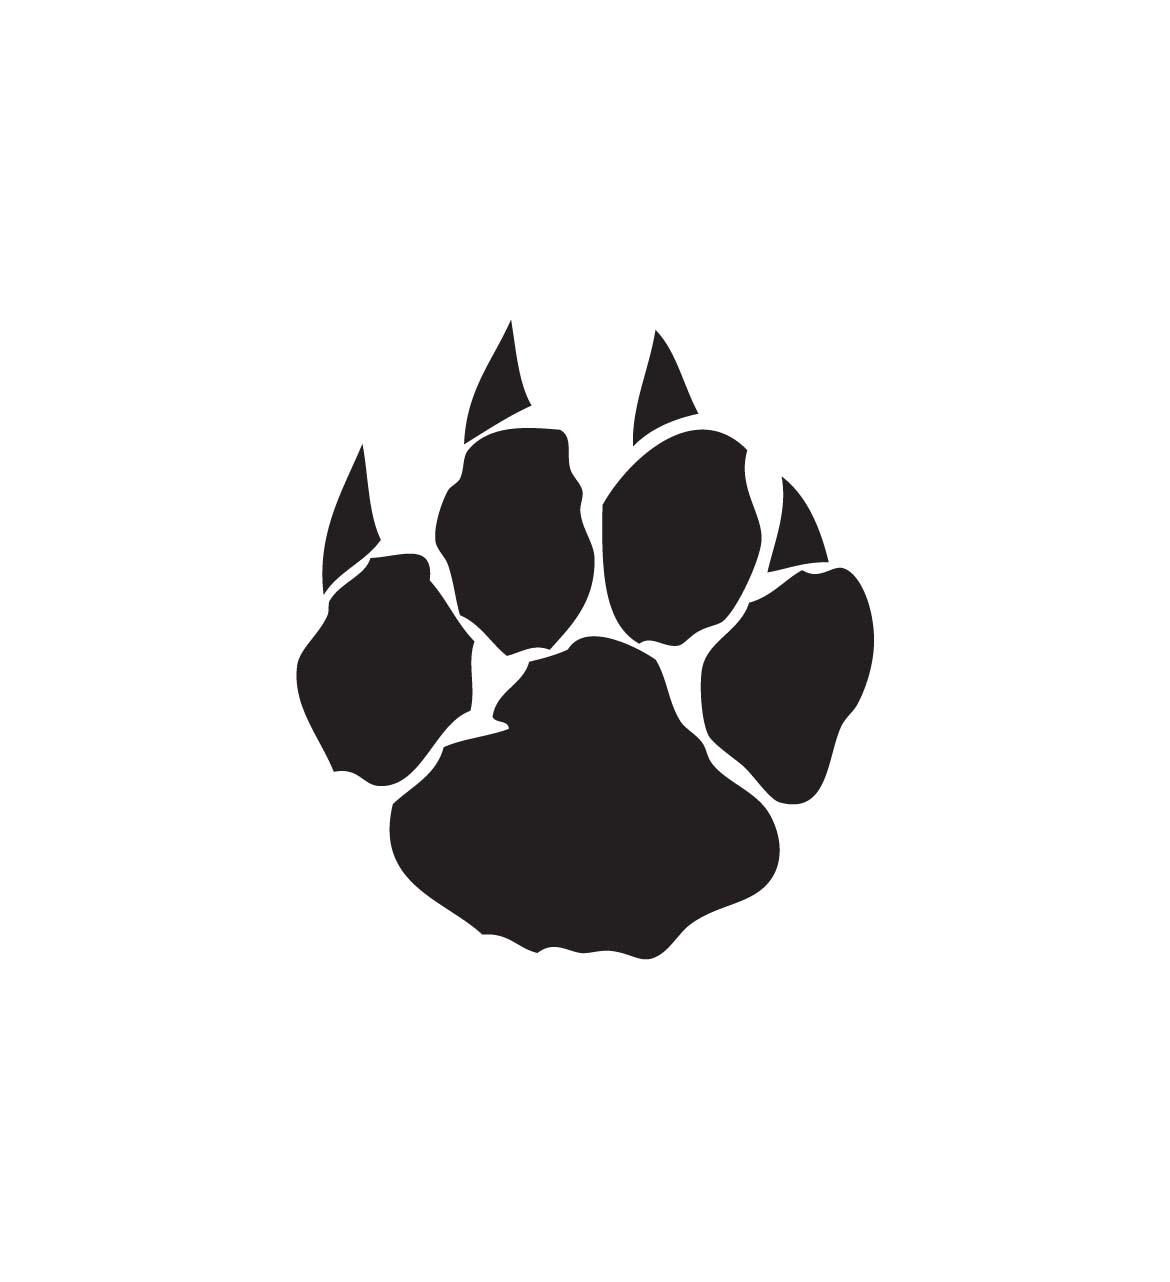 1170x1282 Dog Paw Print Clip Art Free Download 4